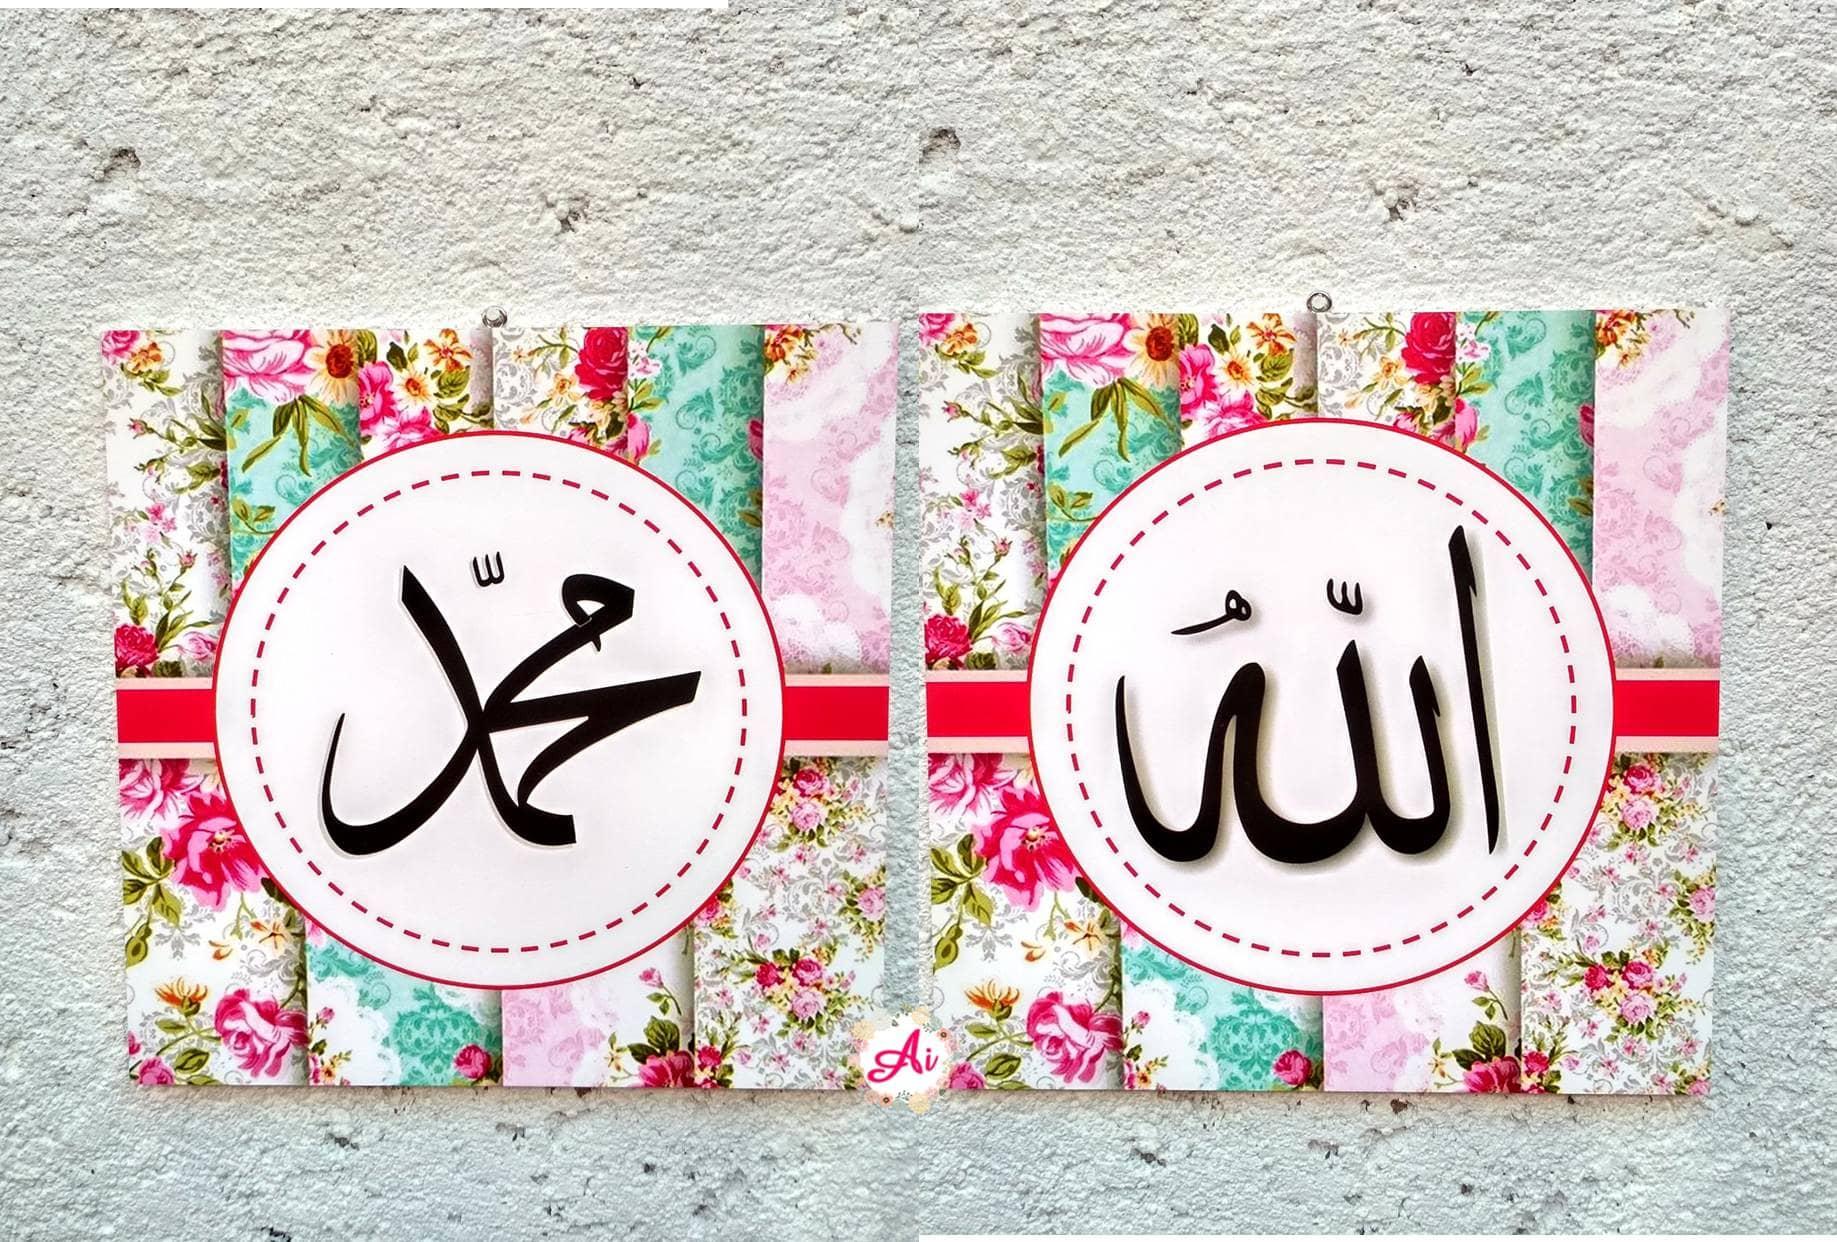 Produk ukm dekorasi rumah l wall decor l hiasan dinding shabby chic kaligrafi 3